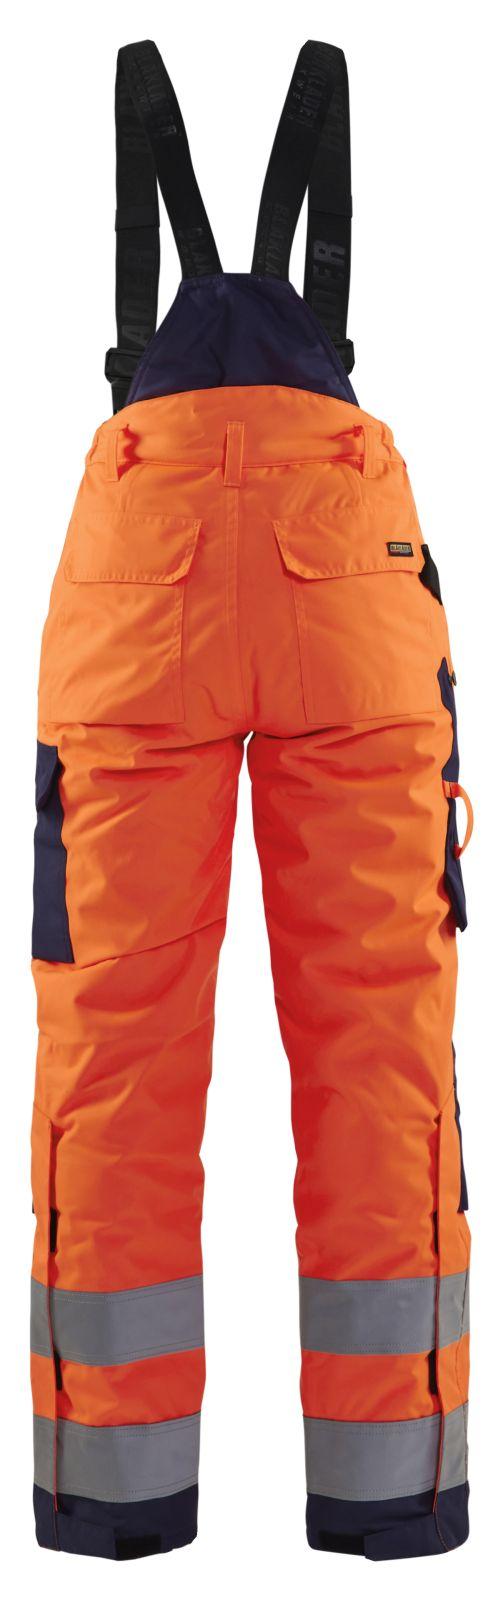 Blaklader Dames winterwerkbroeken 78851977 High Vis oranje-marineblauw(5389)